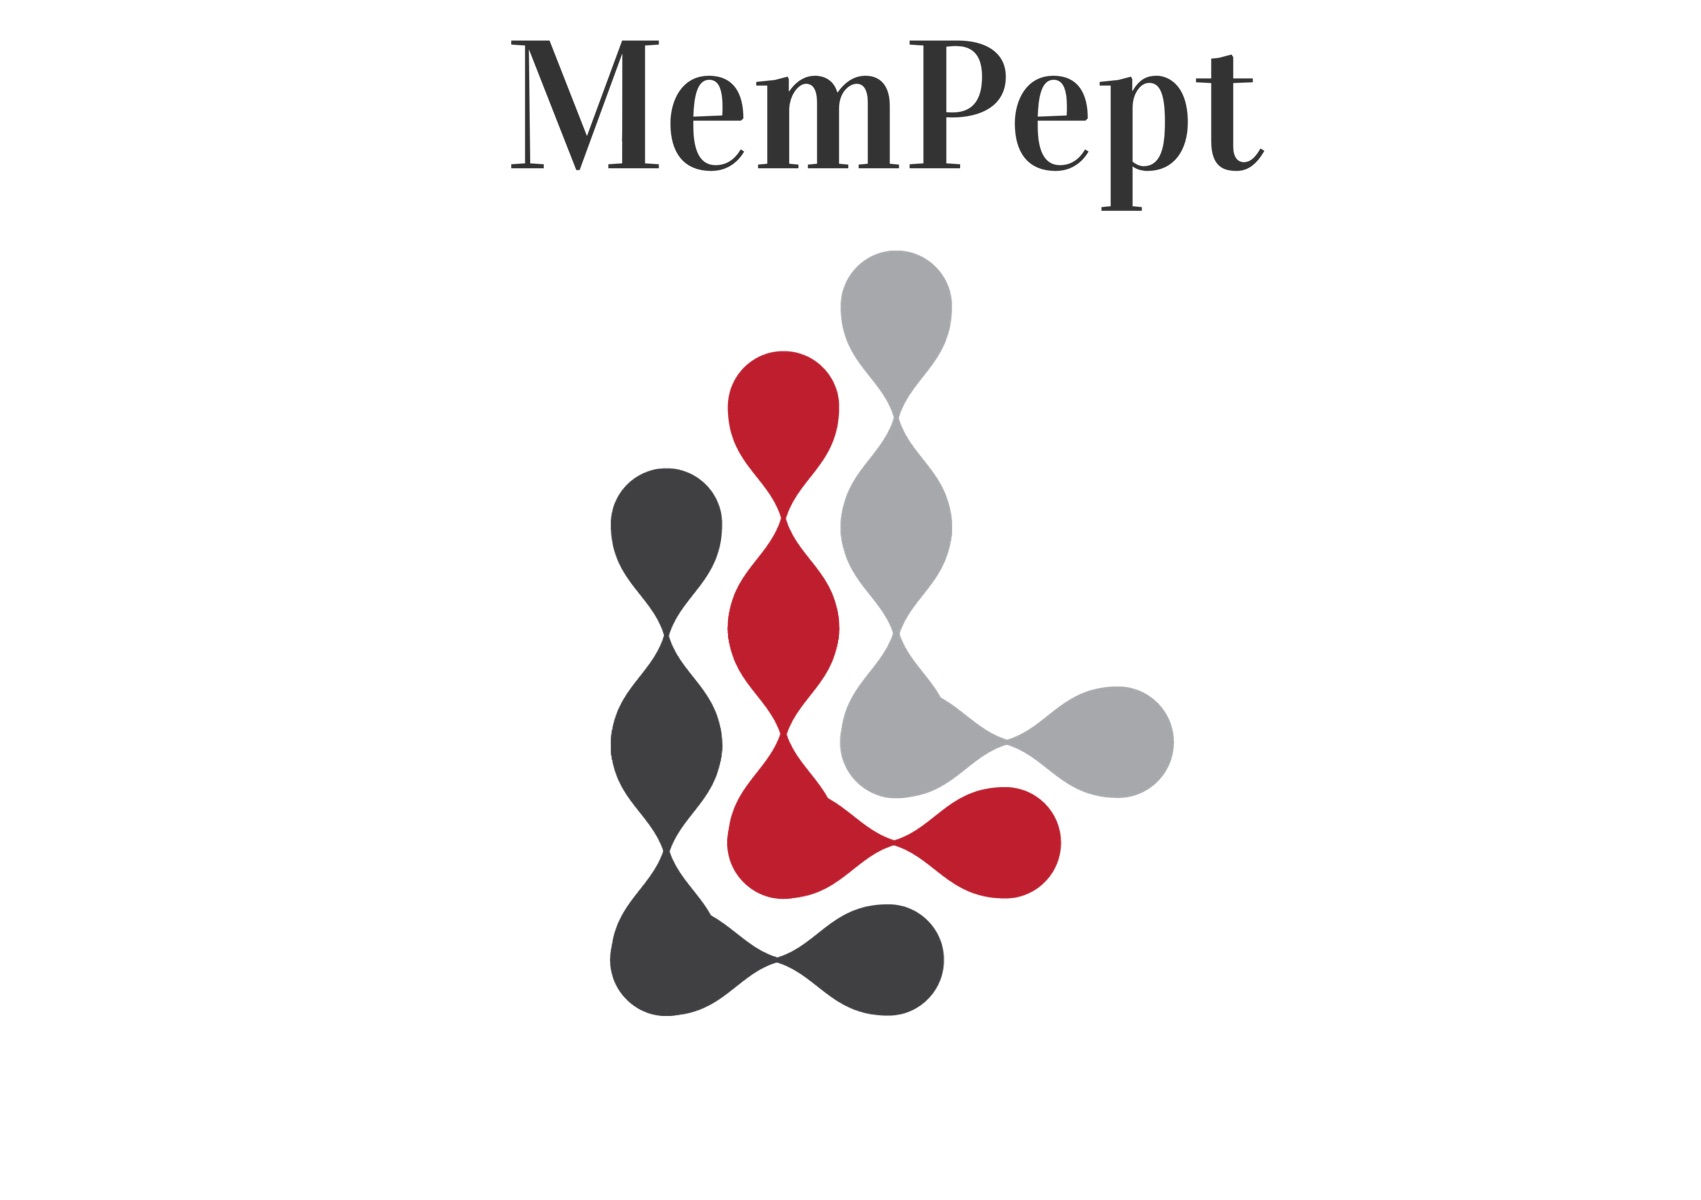 MemPept